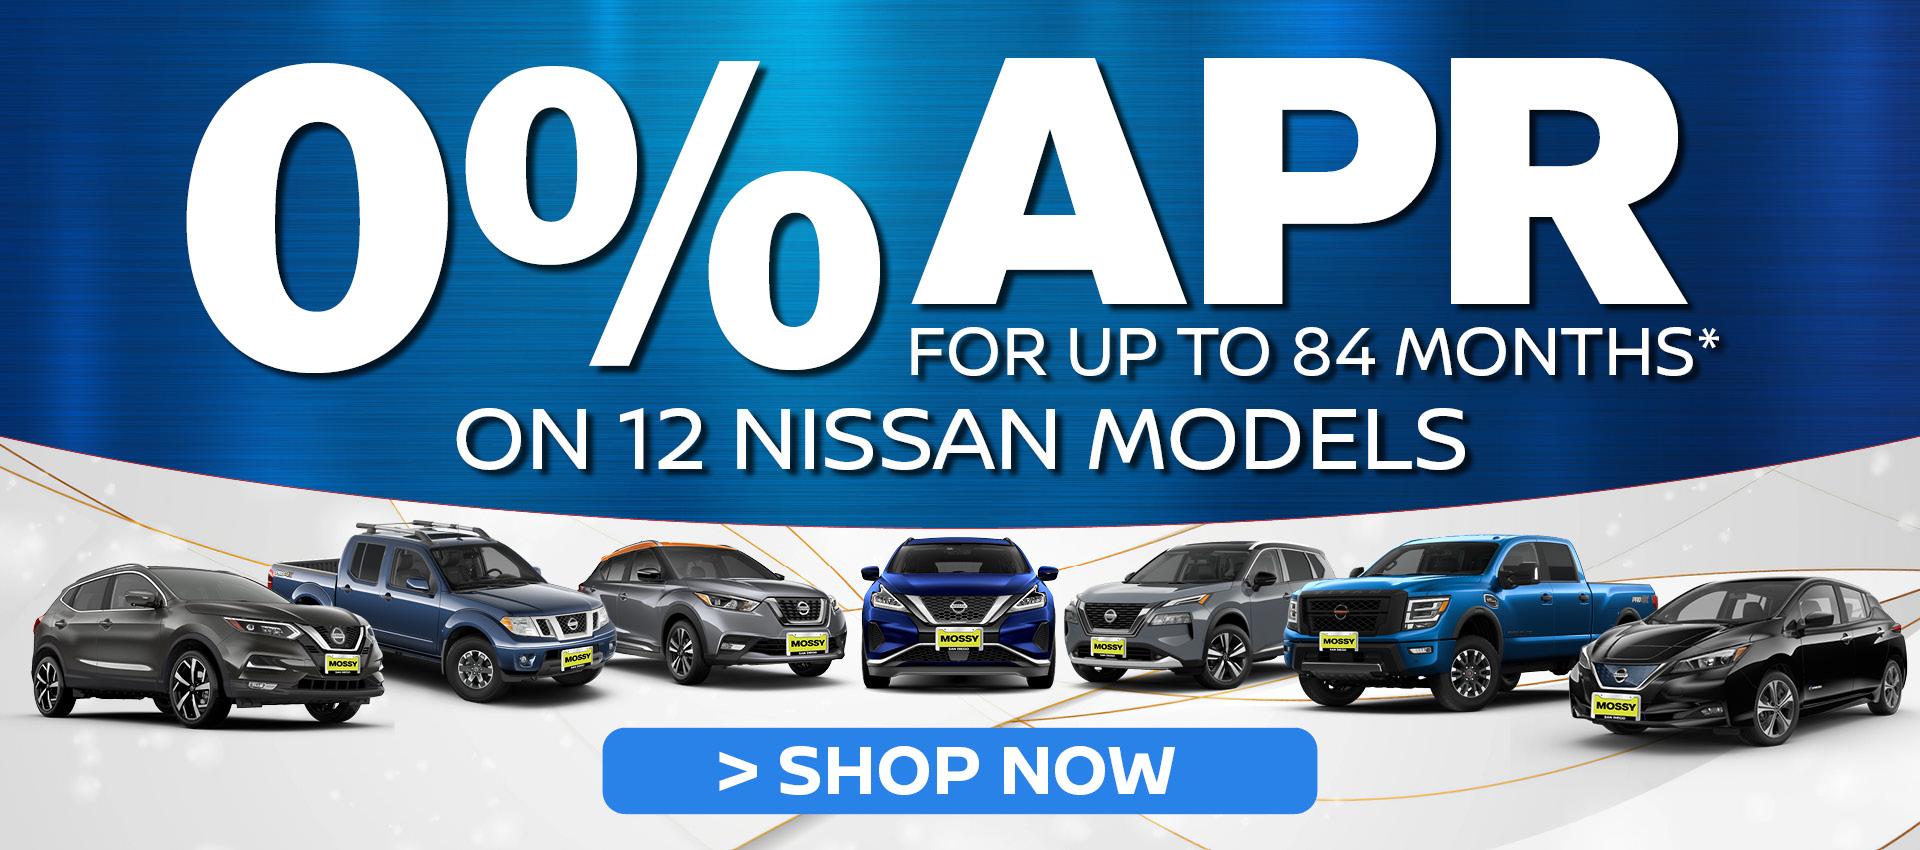 Mossy Nissan - 0%  - HP